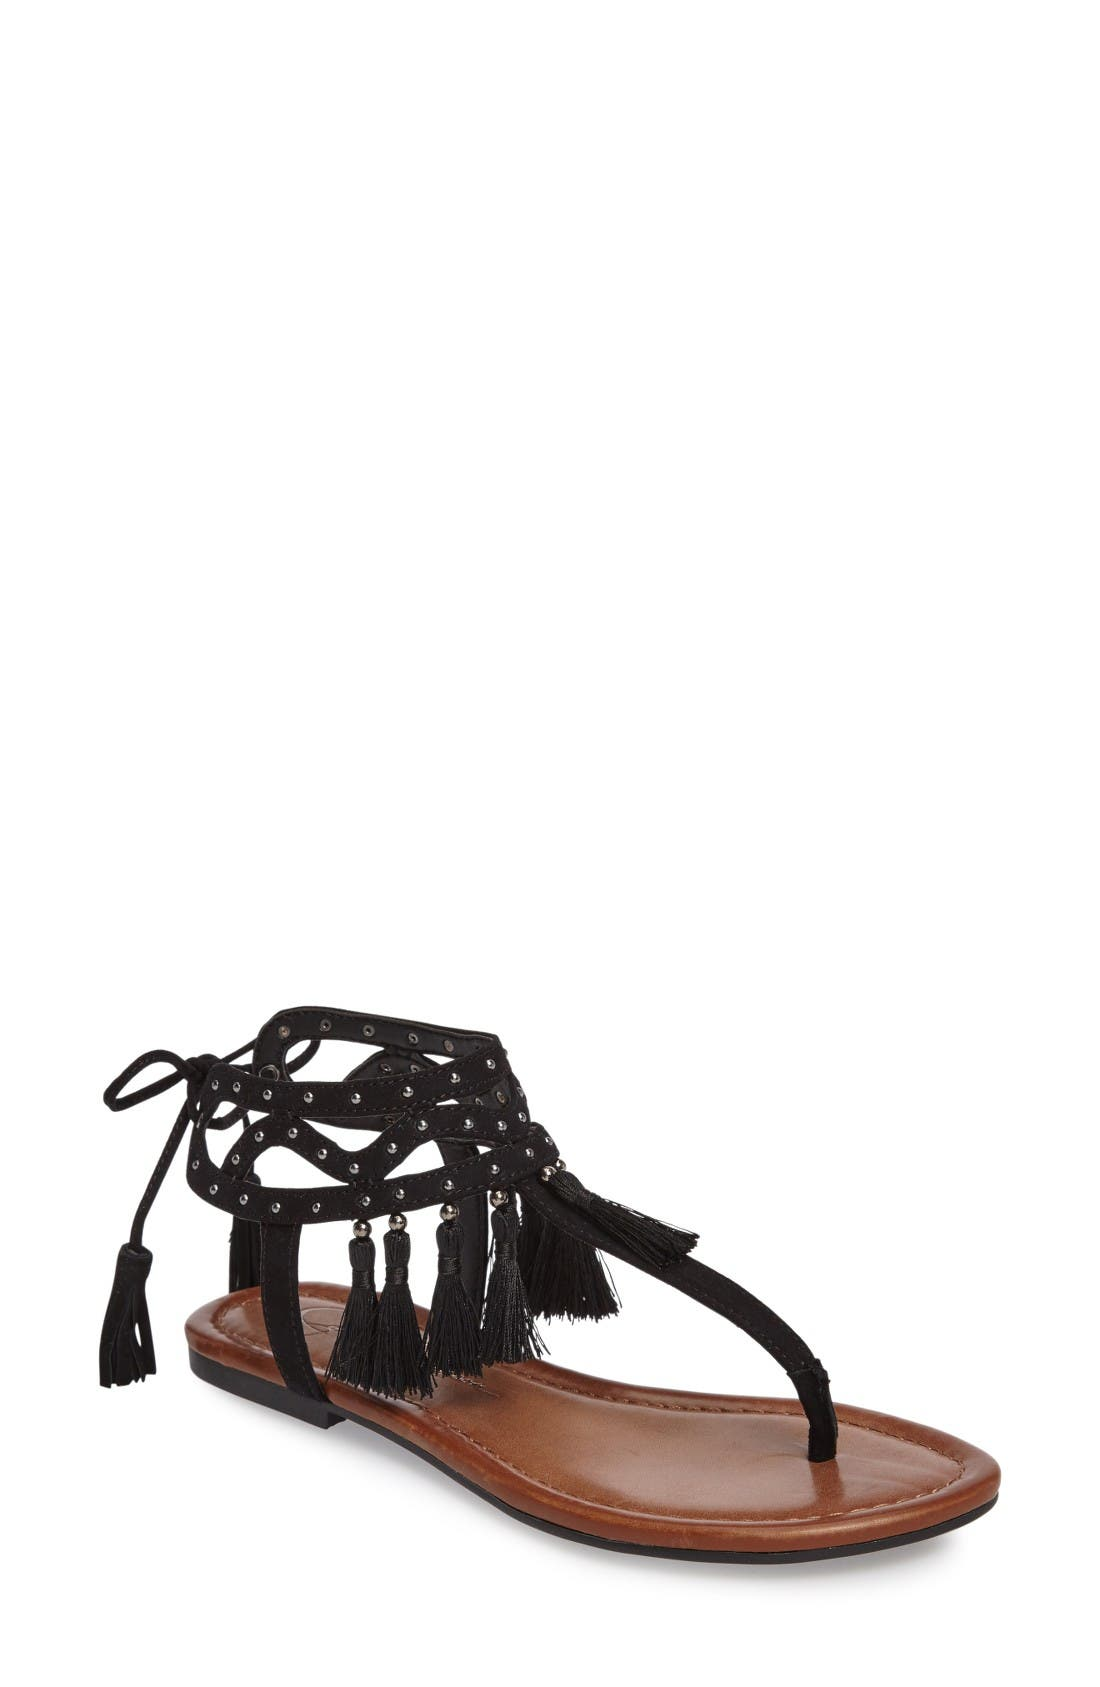 Main Image - Jessica Simpson Kamel Studded Tassel Sandal (Women)